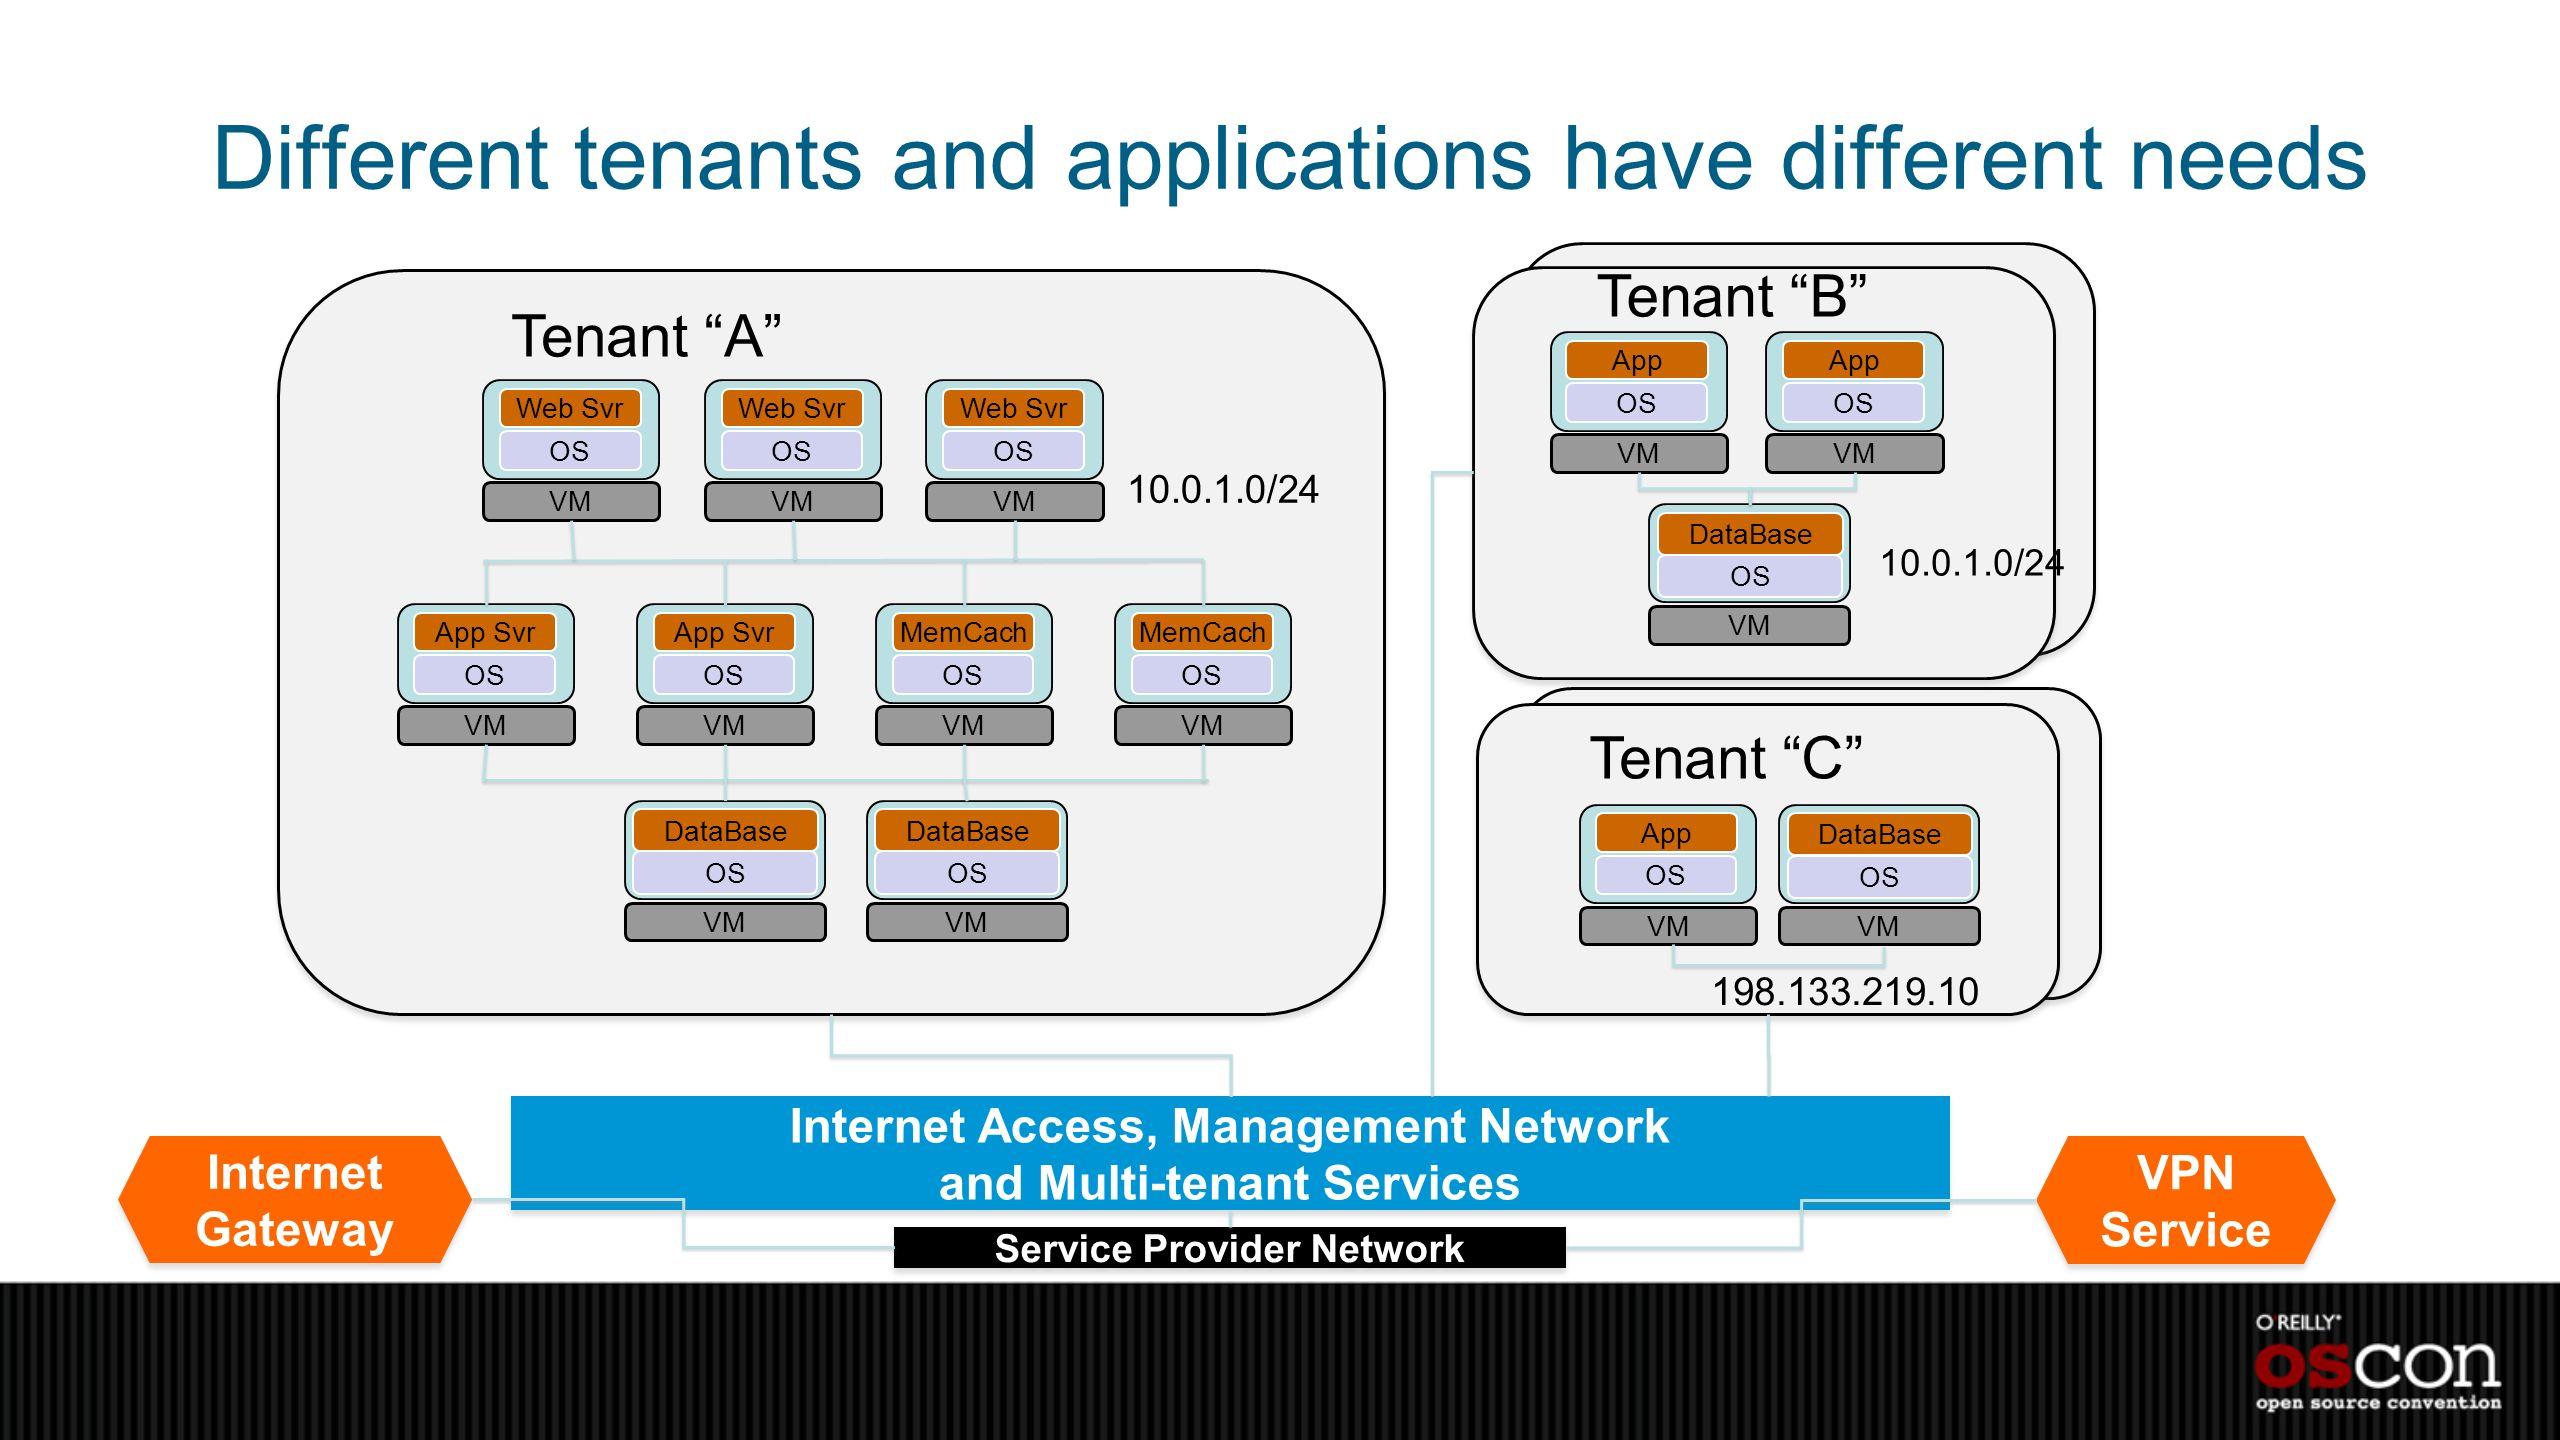 Different tenants and applications have different needs App OS VM DataBase OS VM App OS VM Web Svr OS VM Web Svr OS VM Web Svr OS VM App Svr OS VM App